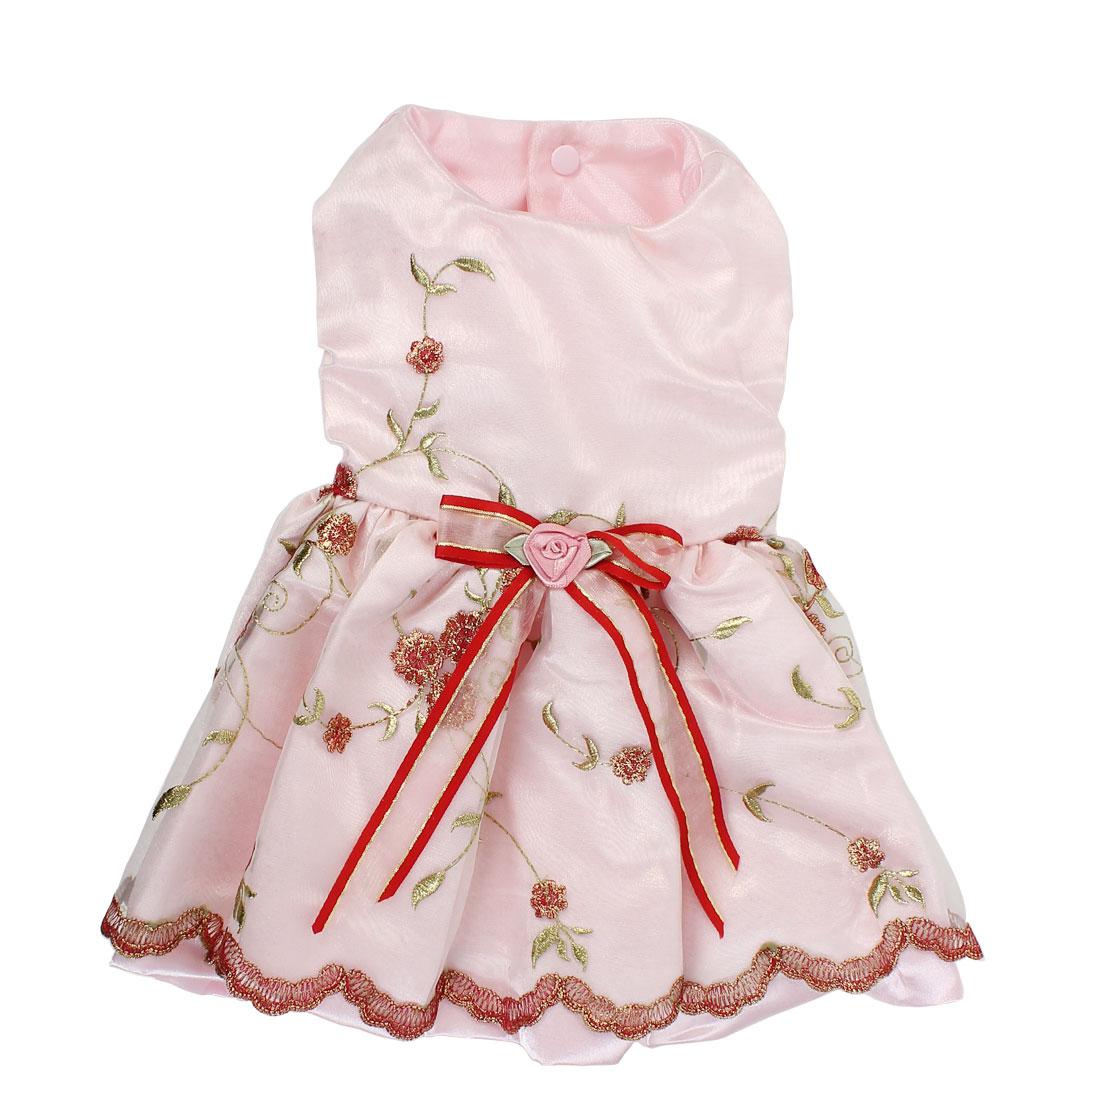 Pet Dog Princess Wedding Dress Rosettes Bowknots Design Skirt Pink Size M